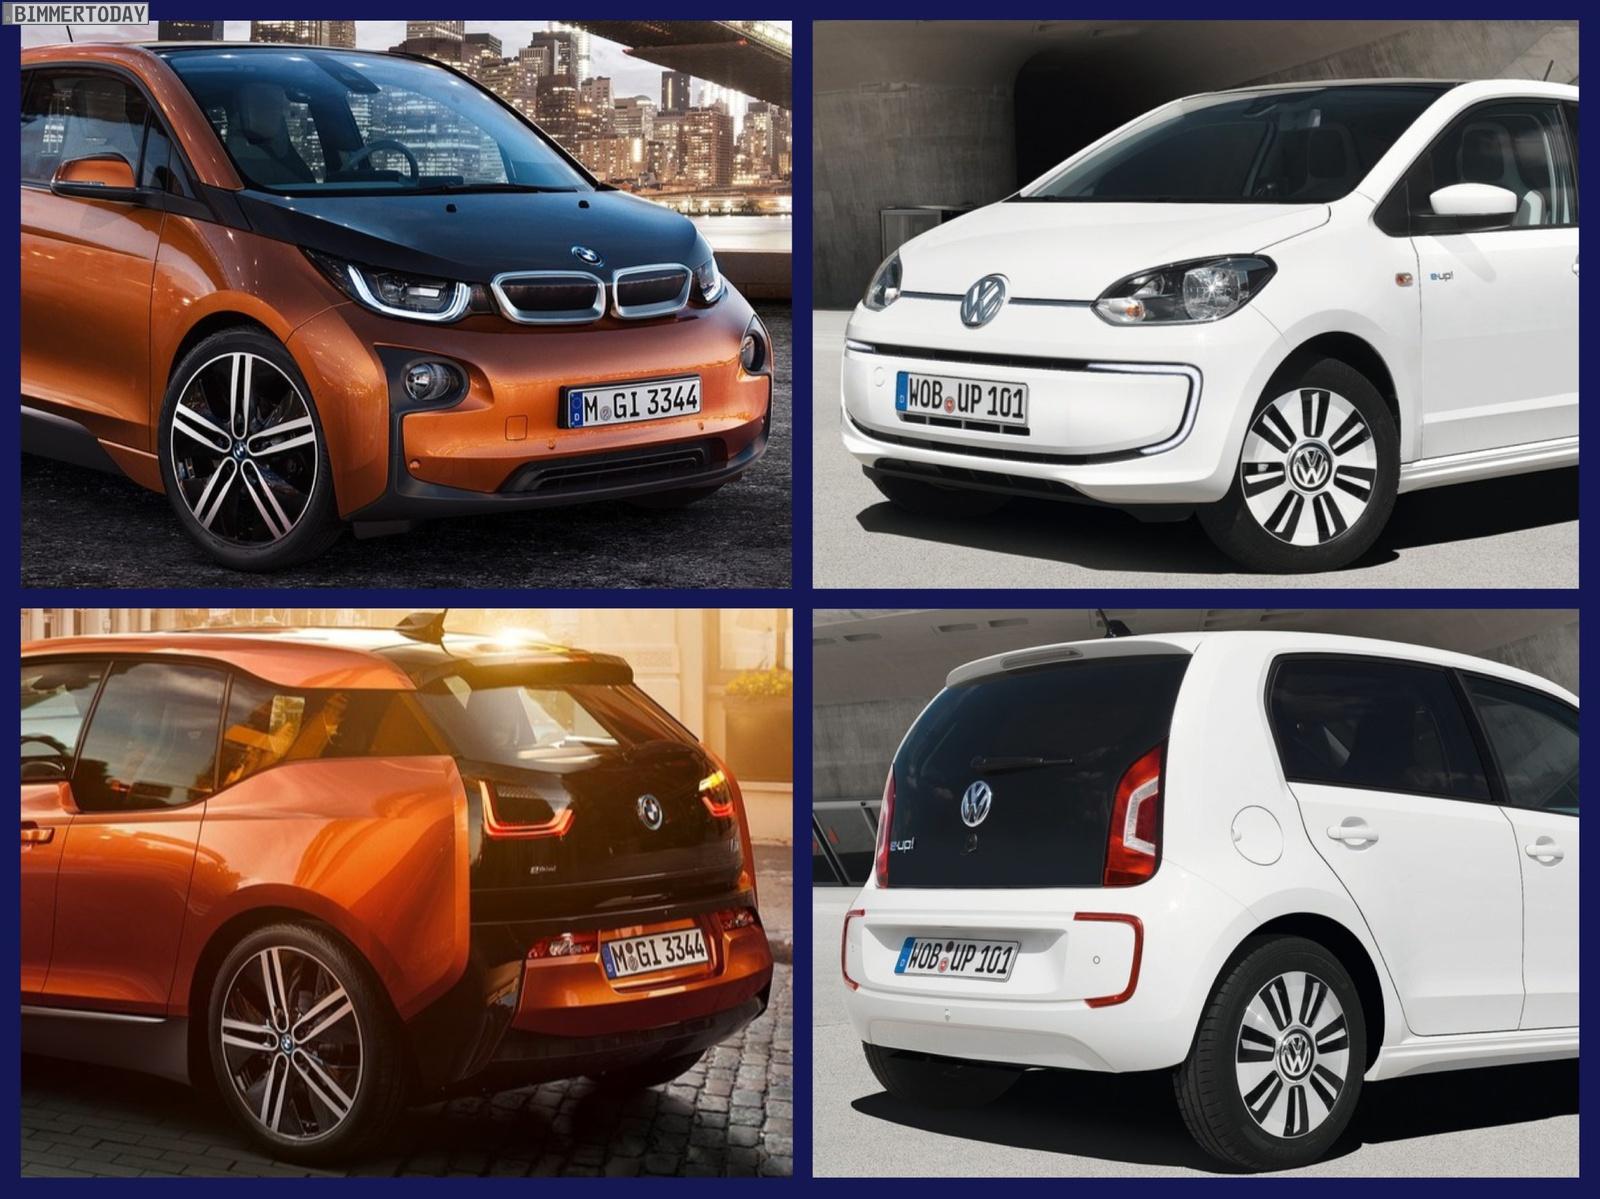 Bild Vergleich BMW i3 eDrive VW e Up 2013